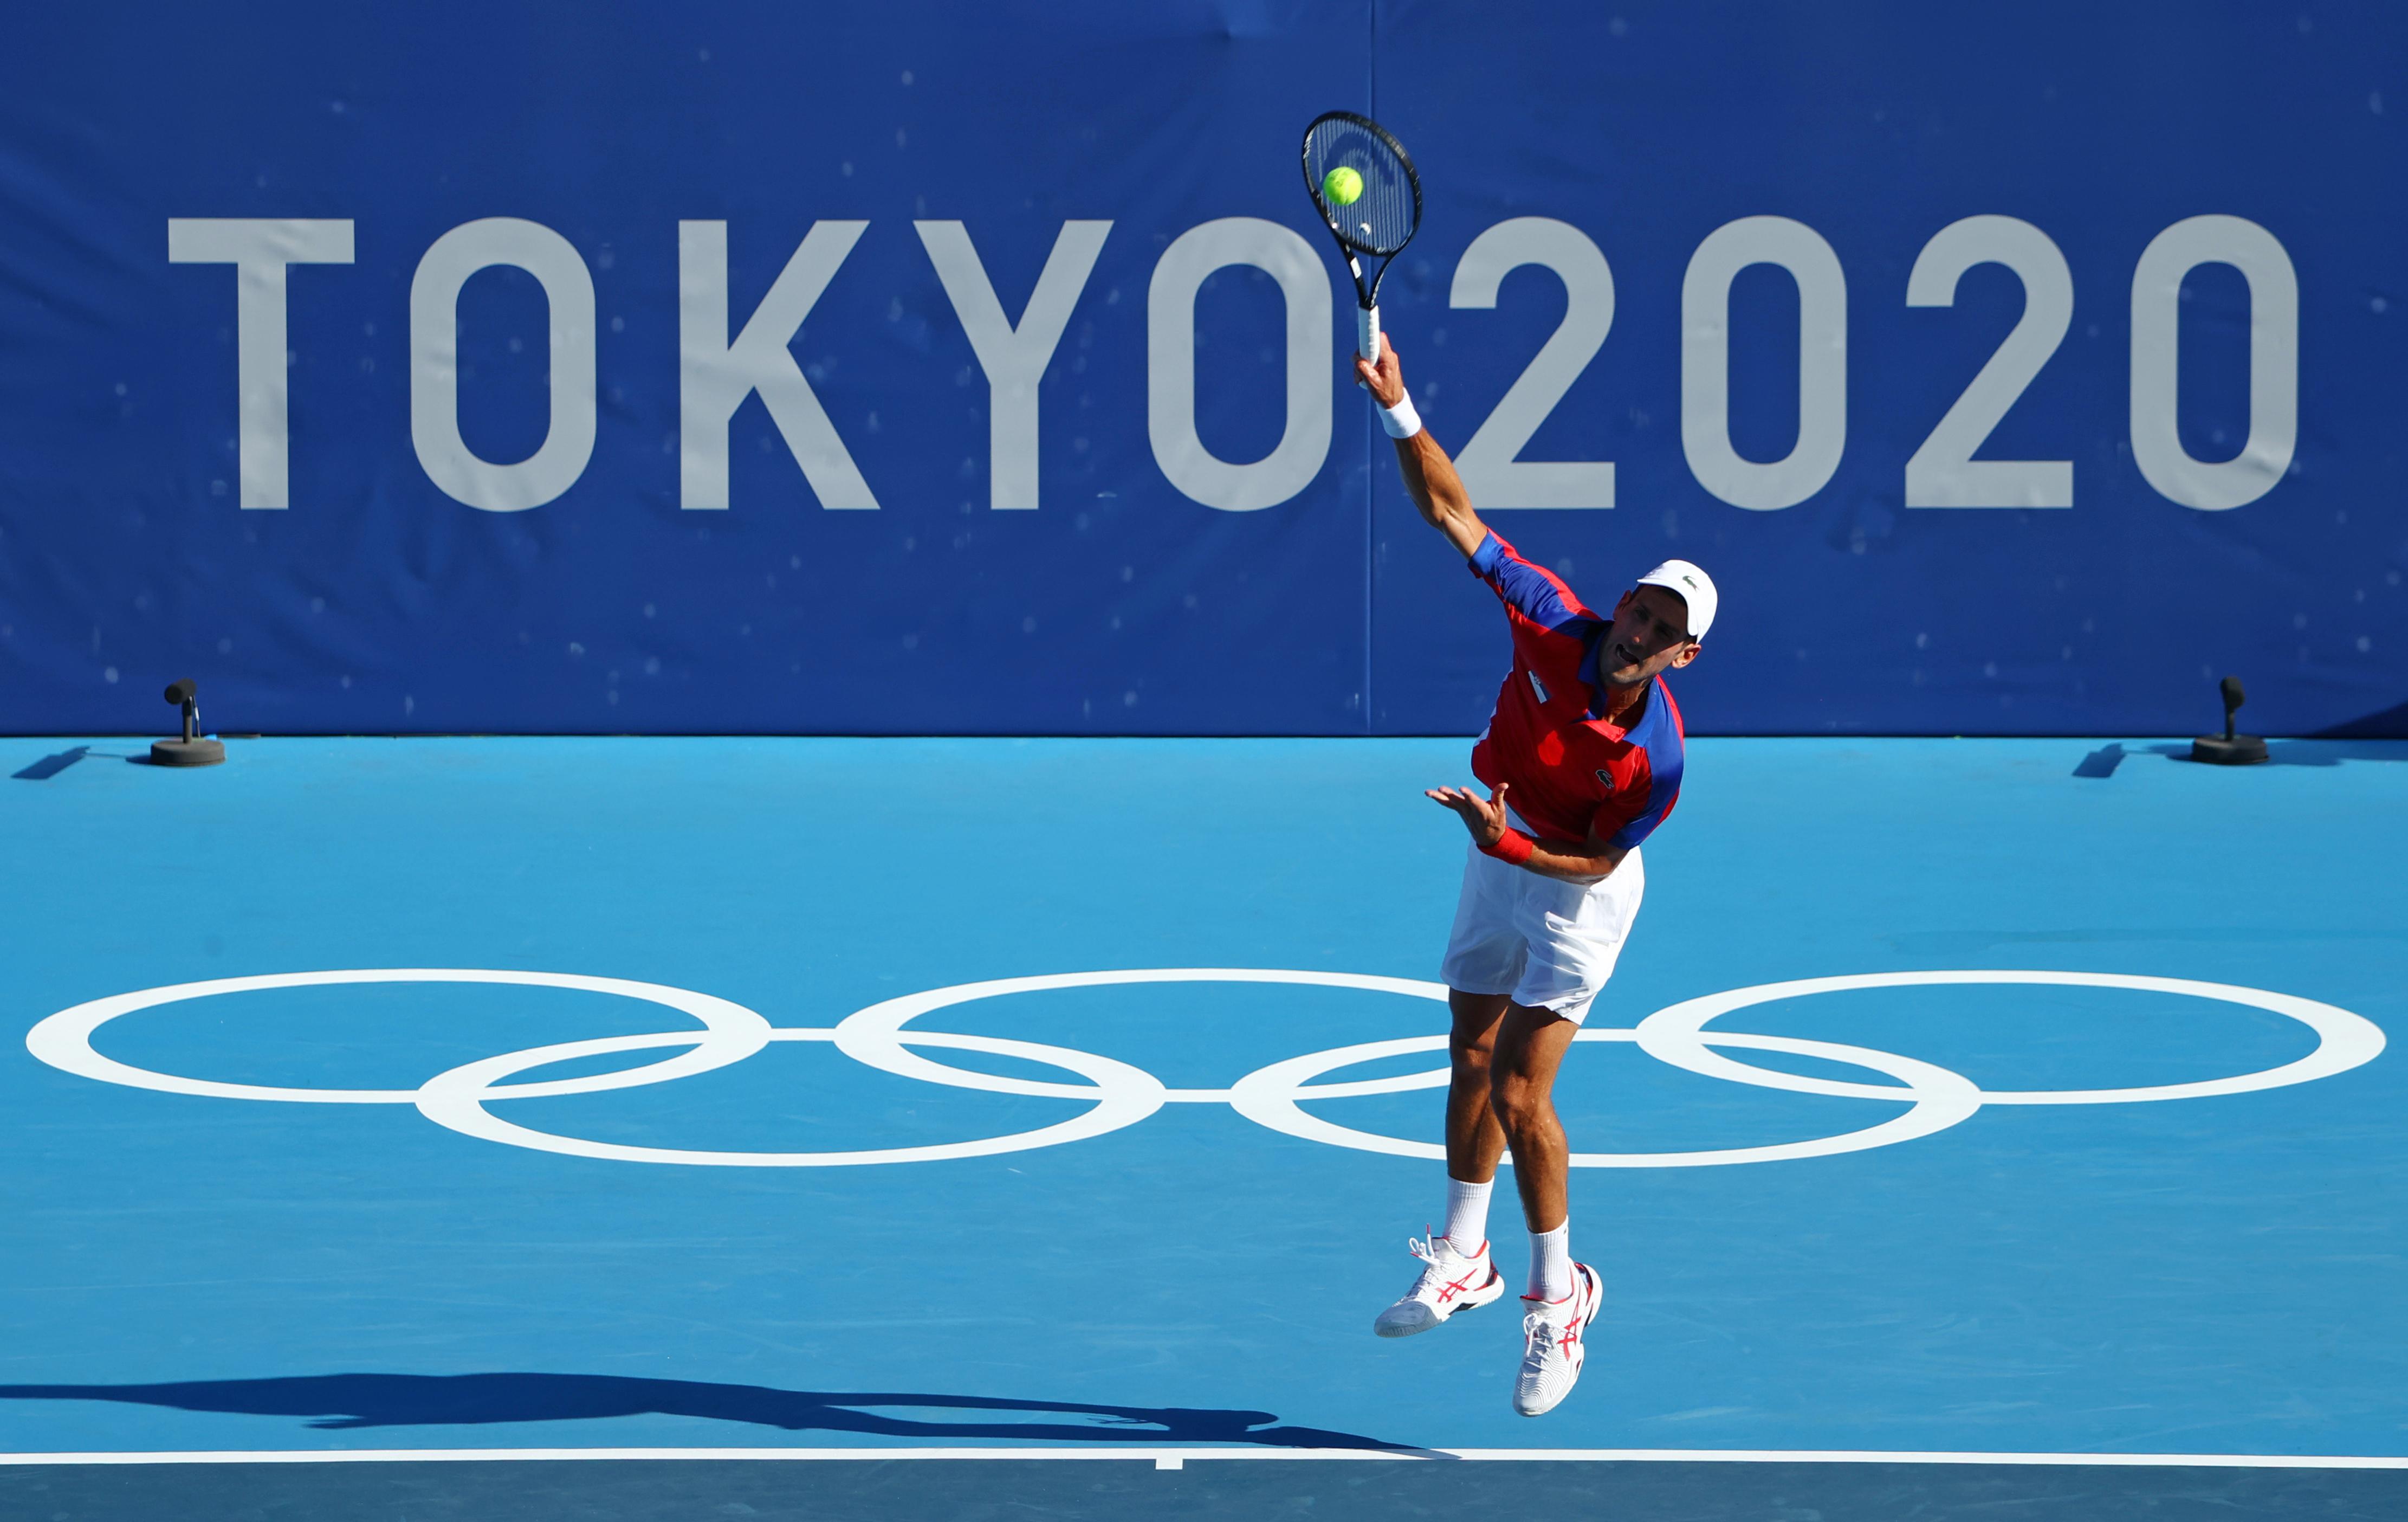 Tokyo 2020 Olympics - Tennis - Men's Singles - Round 1 - Ariake Tennis Park - Tokyo, Japan - July 24, 2021. Novak Djokovic of Serbia in action during his first round match against Hugo Dellien of Bolivia REUTERS/Mike Segar